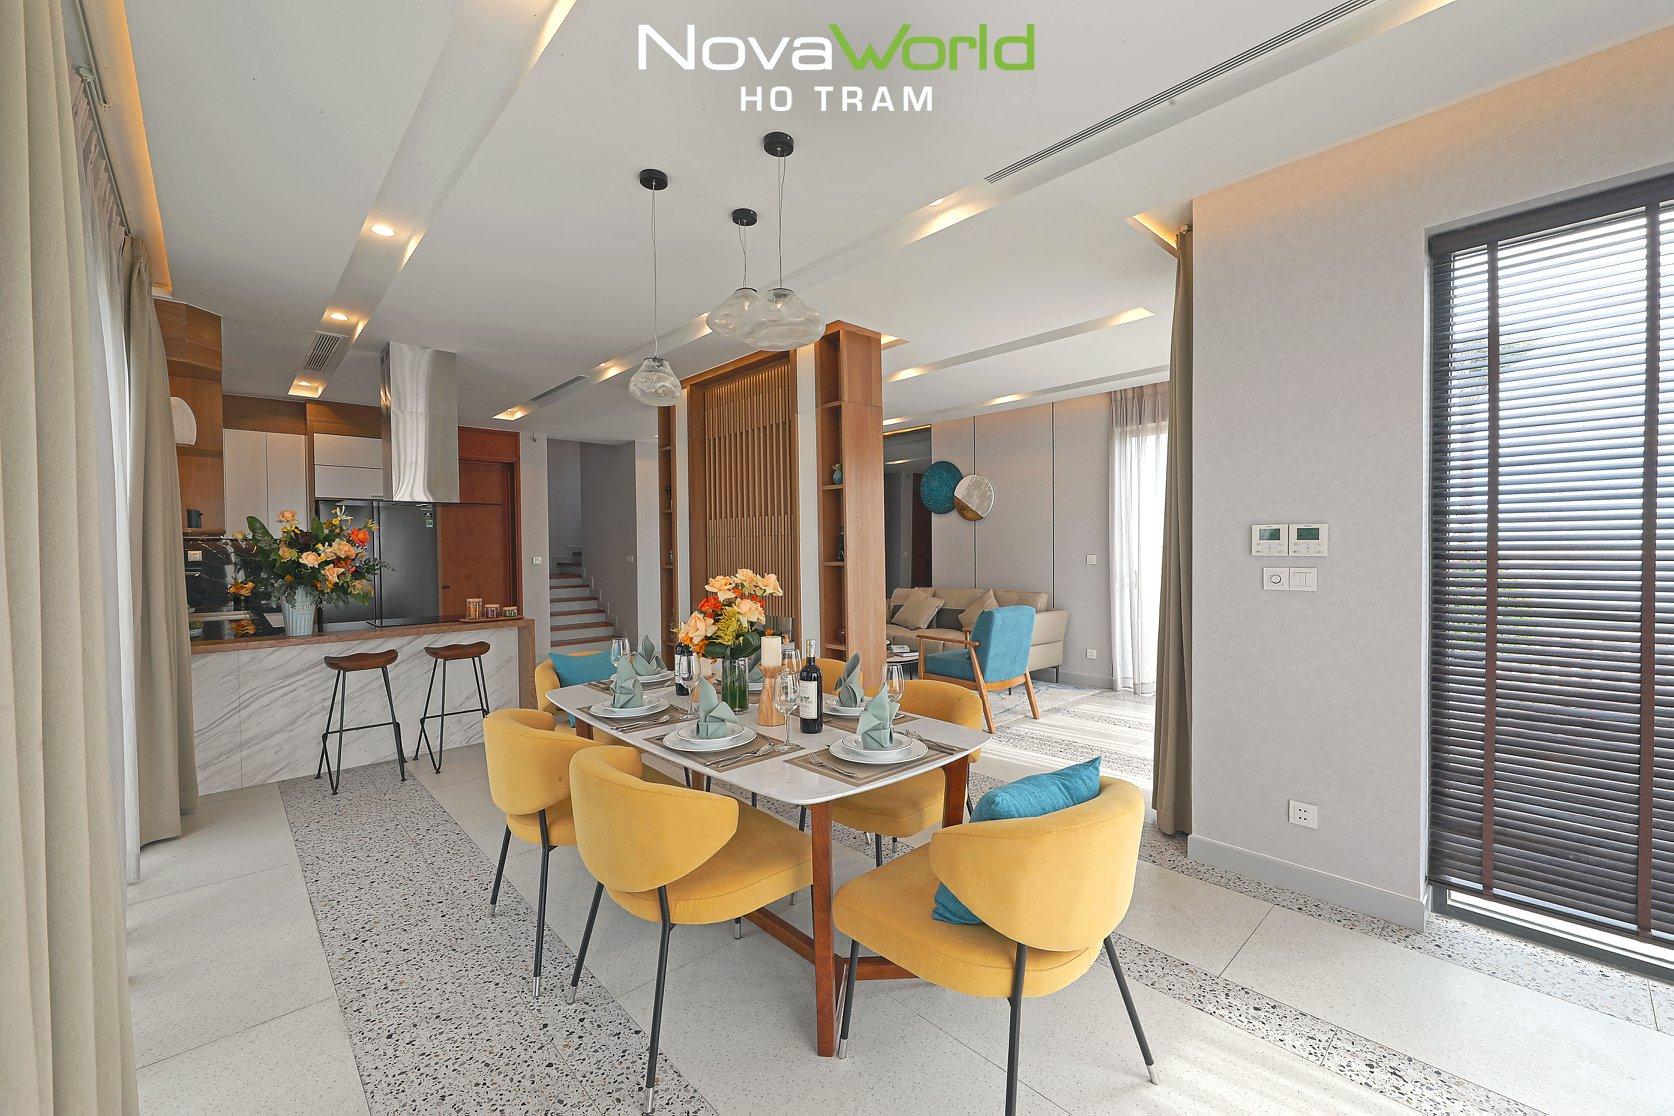 nha-mau-novaworld-ho-tram-9